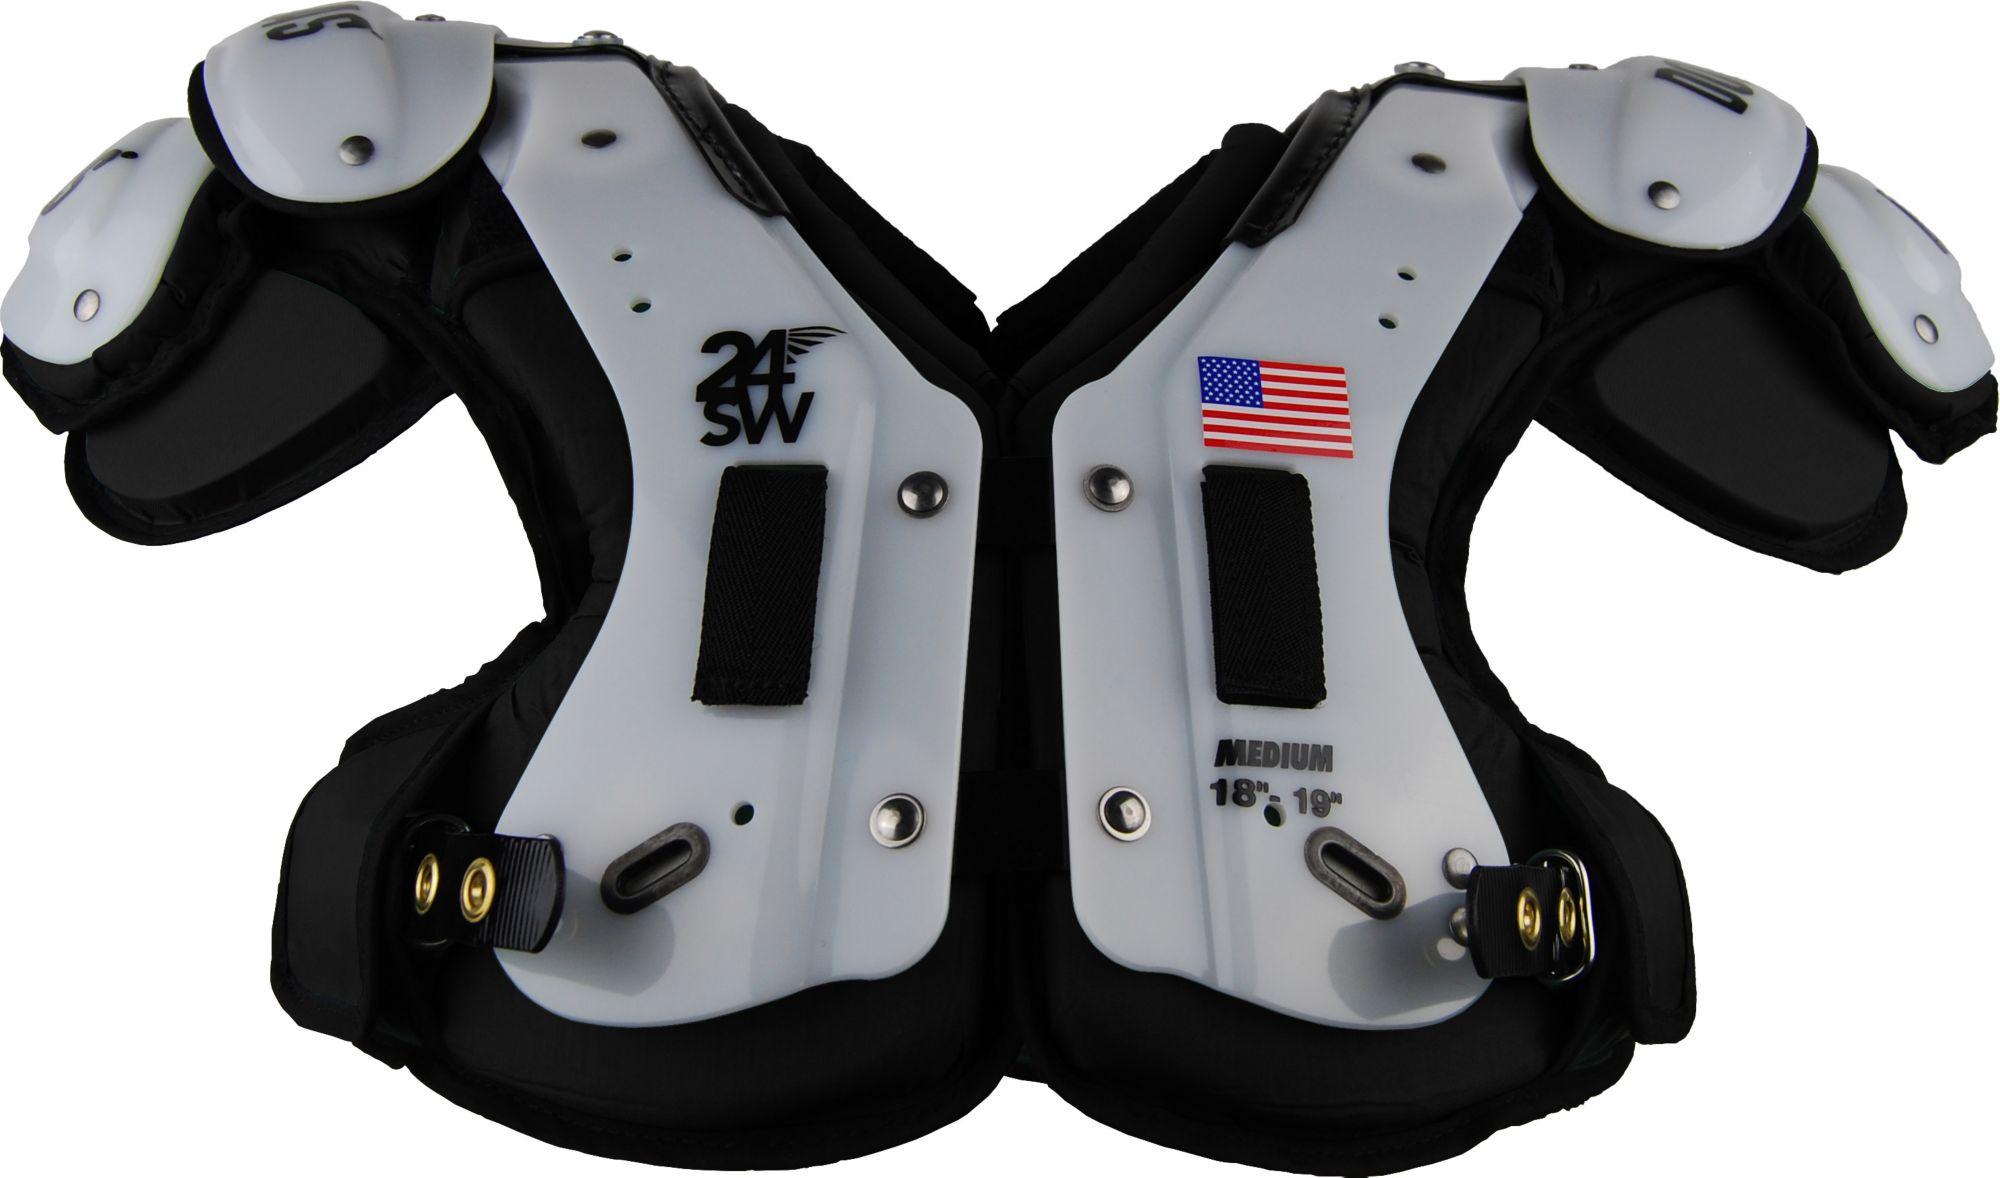 Douglas Adult 24SW Flat Skill Position Shoulder Pads Black XXL - Walmart.com e74d1facb